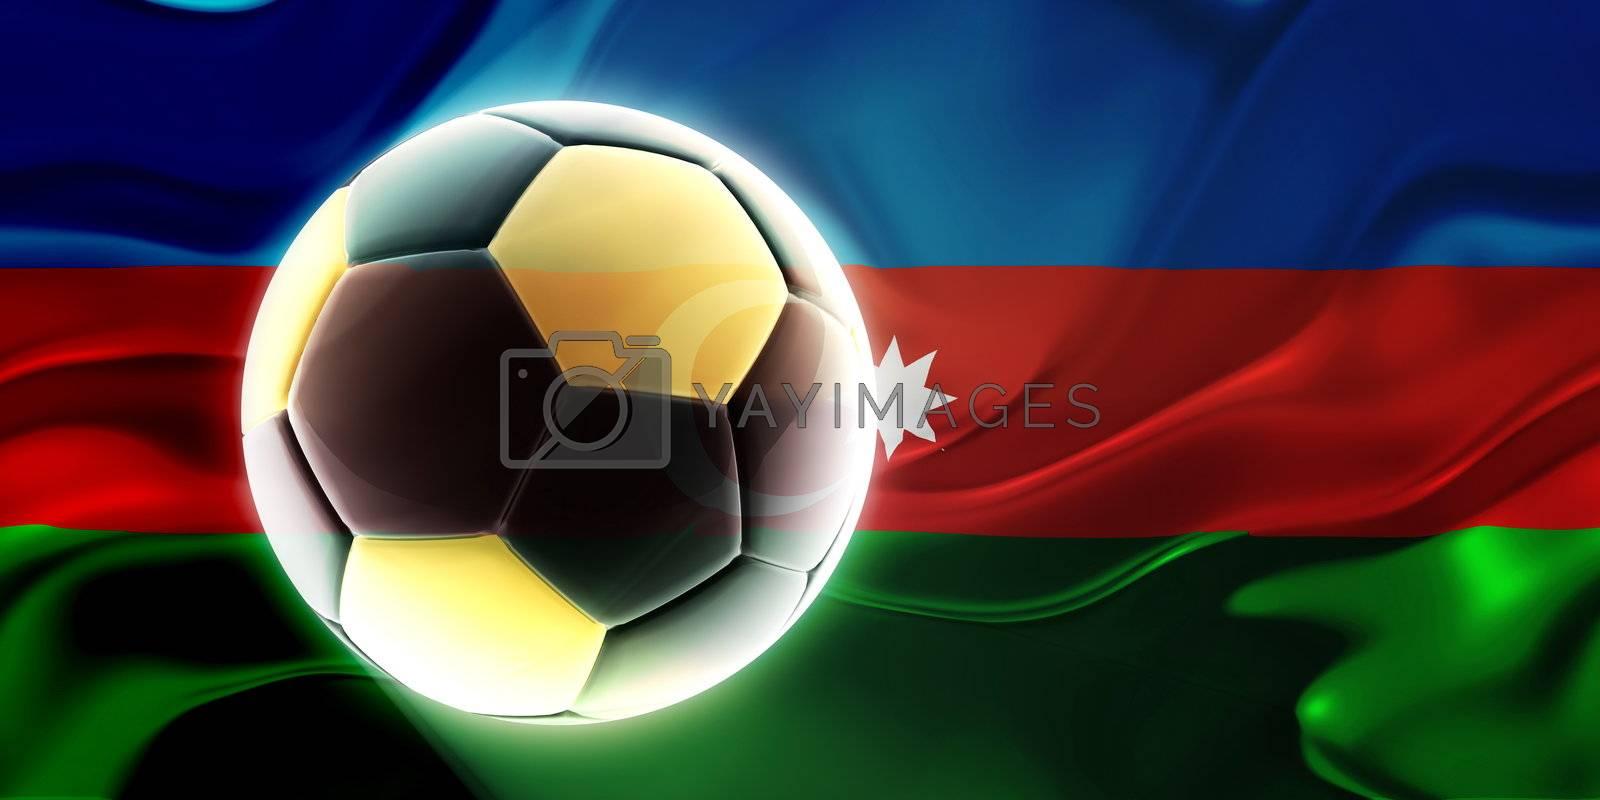 Royalty free image of Flag of Azerbaijan wavy soccer by kgtoh